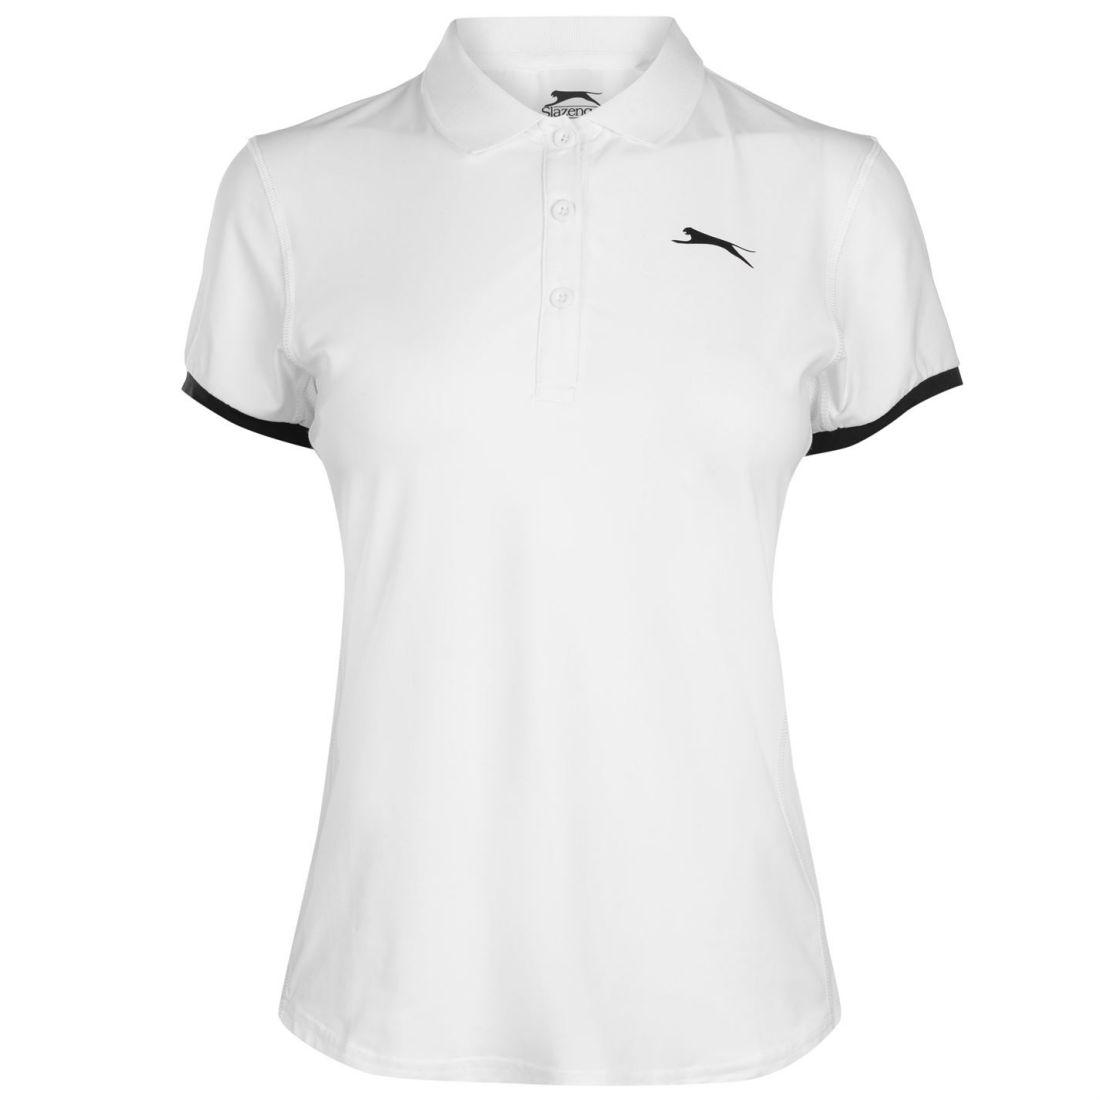 03fa5f12c Image is loading Slazenger-Court-Polo-Shirt-Ladies-Short-Sleeve-Performance-